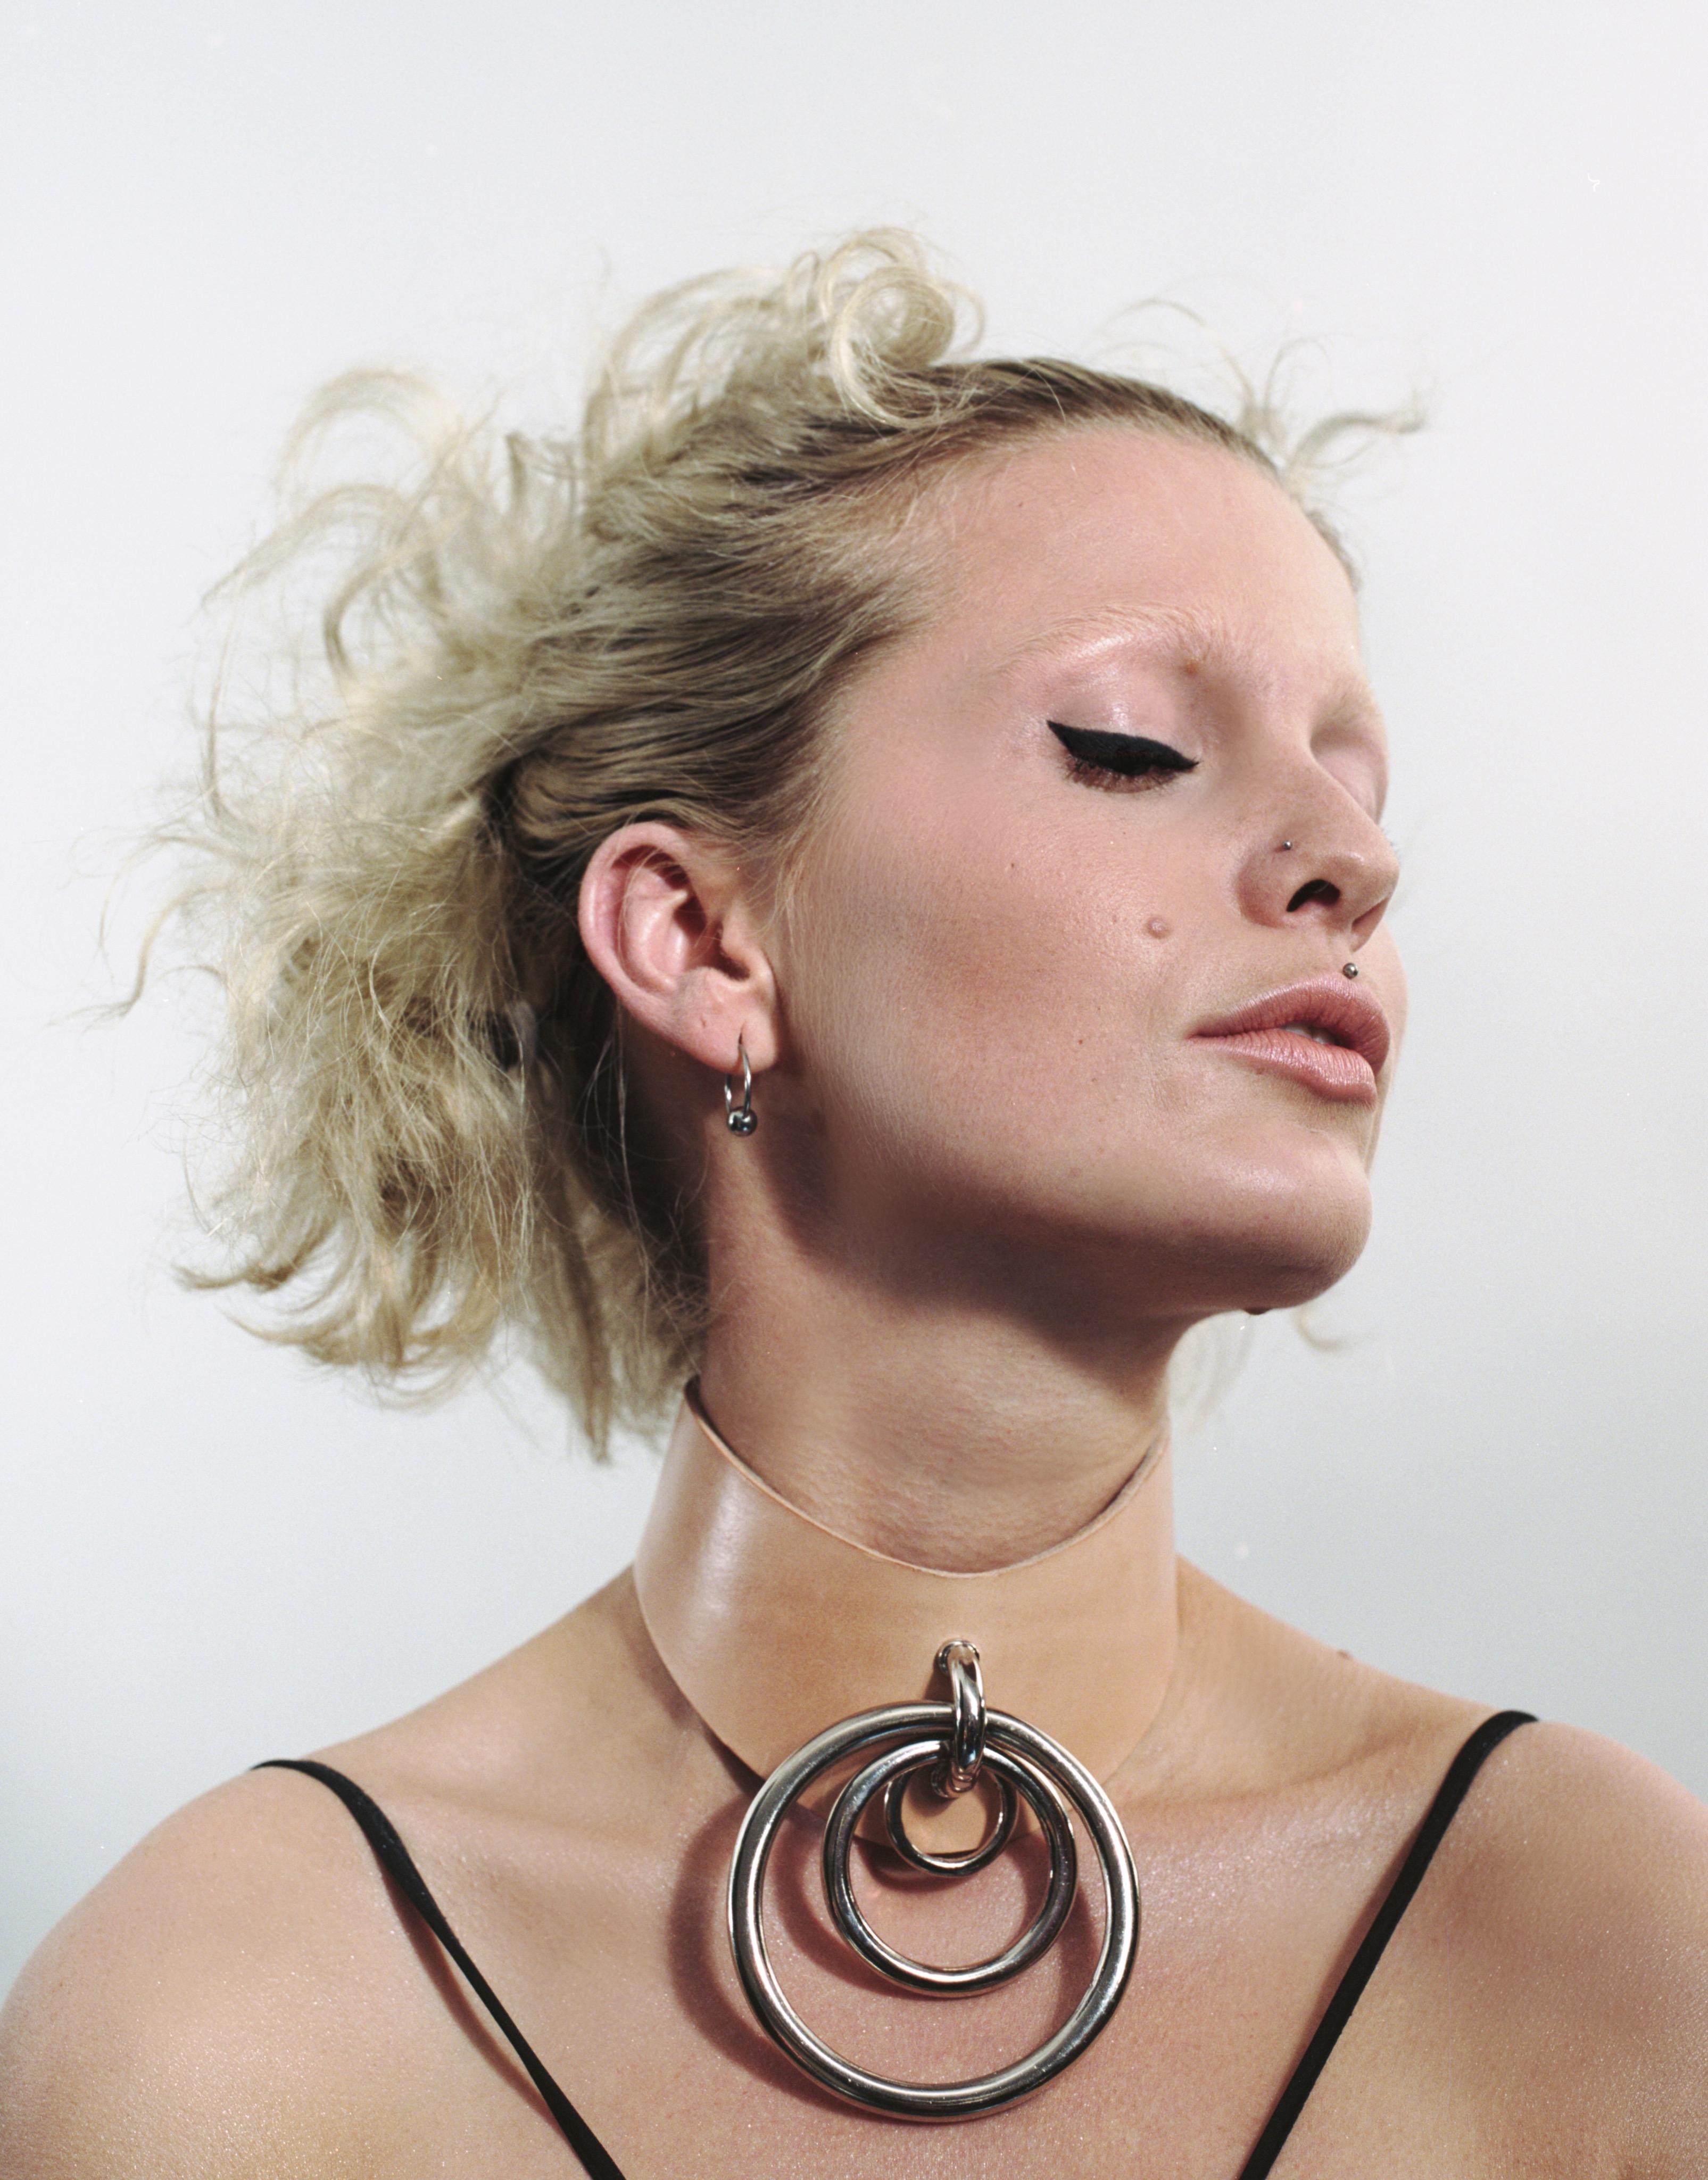 sasha-oneill-make-up-artist_tamzin-lillywhite_8